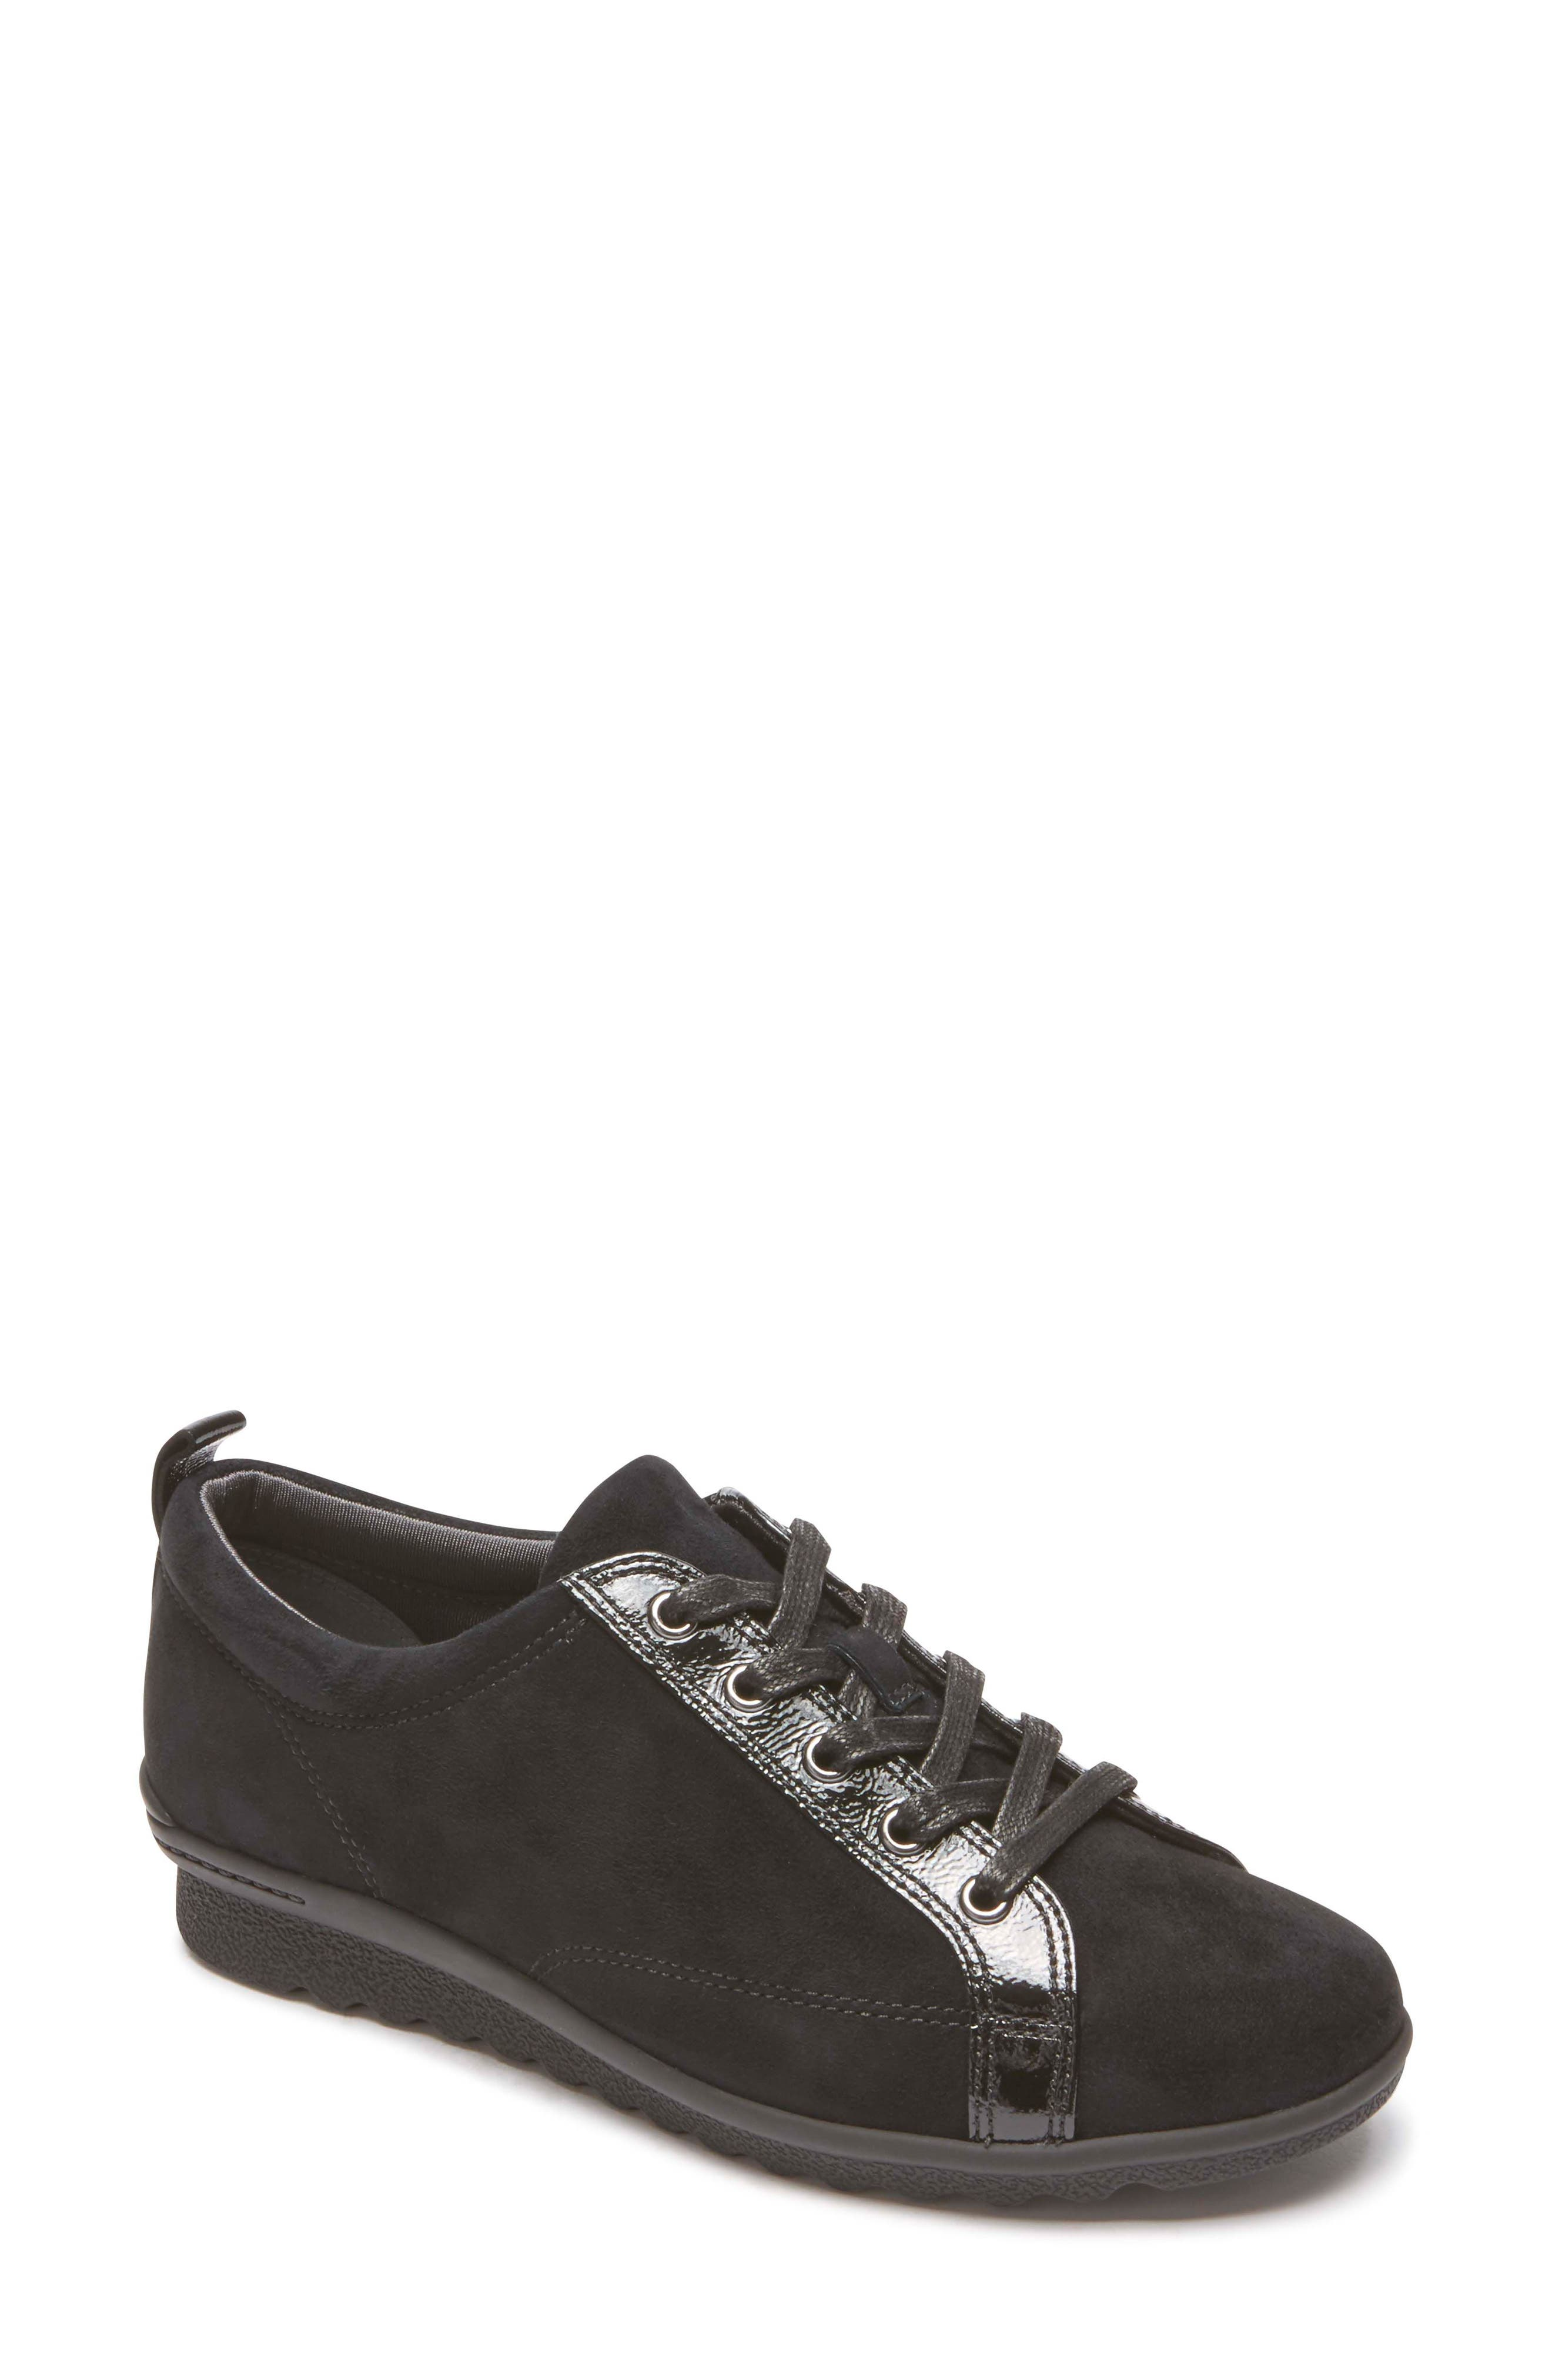 Chenole Wedge Sneaker,                         Main,                         color, BLACK SUEDE